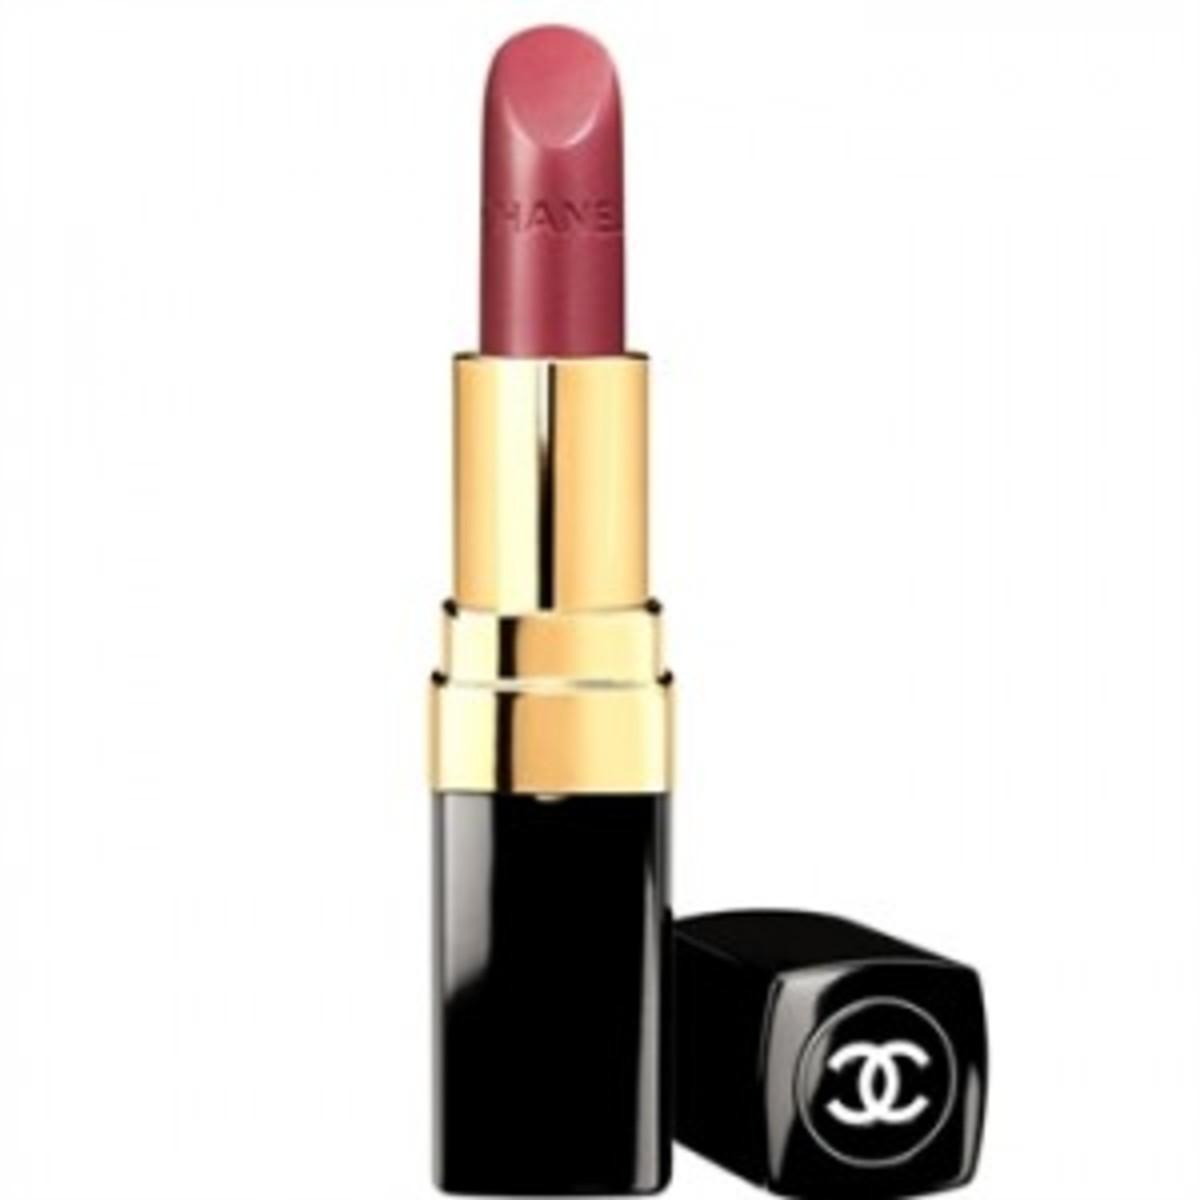 chanel-rouge-coco-lipstick-300x300